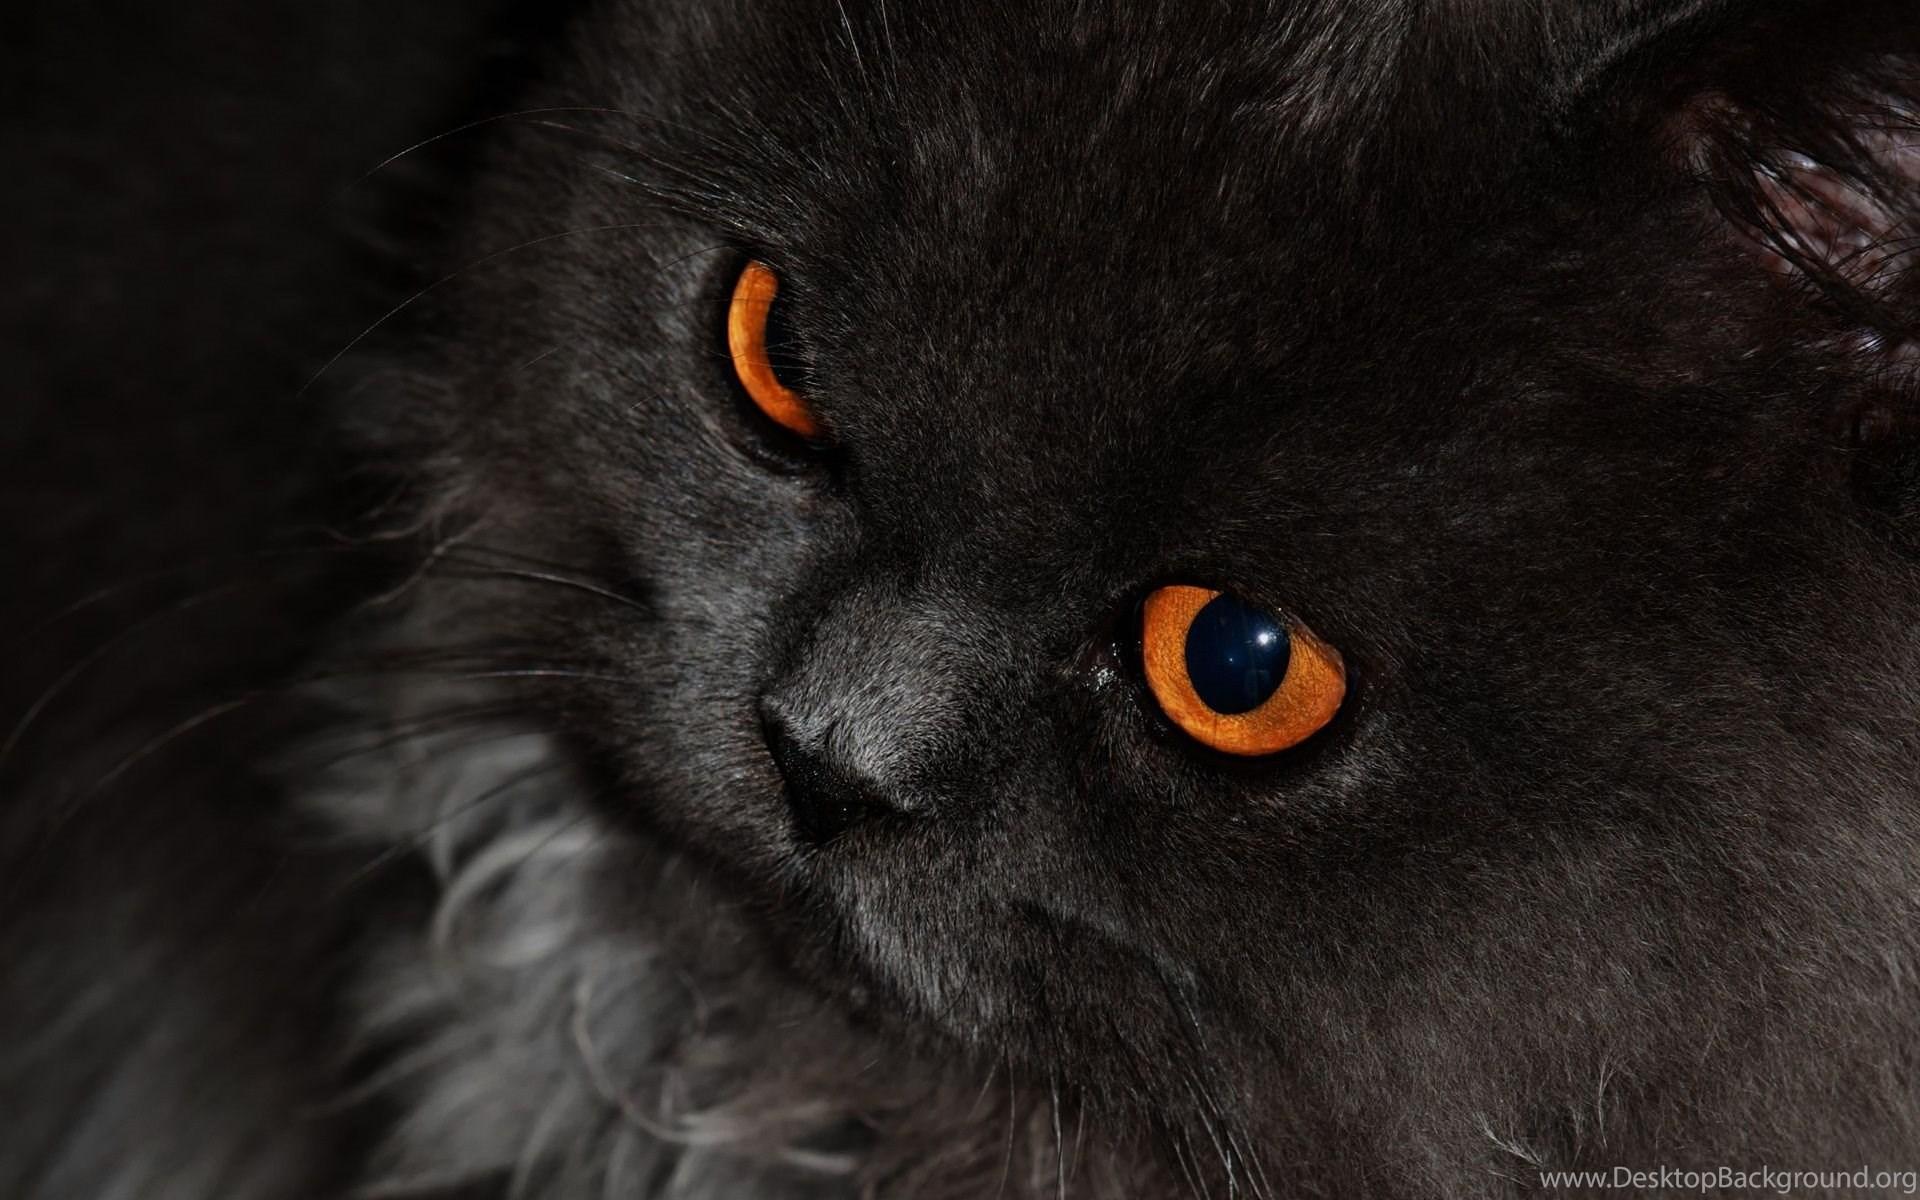 Black Cat With Orange Eyes Hd Wallpapers Windows 10 Wallpapers